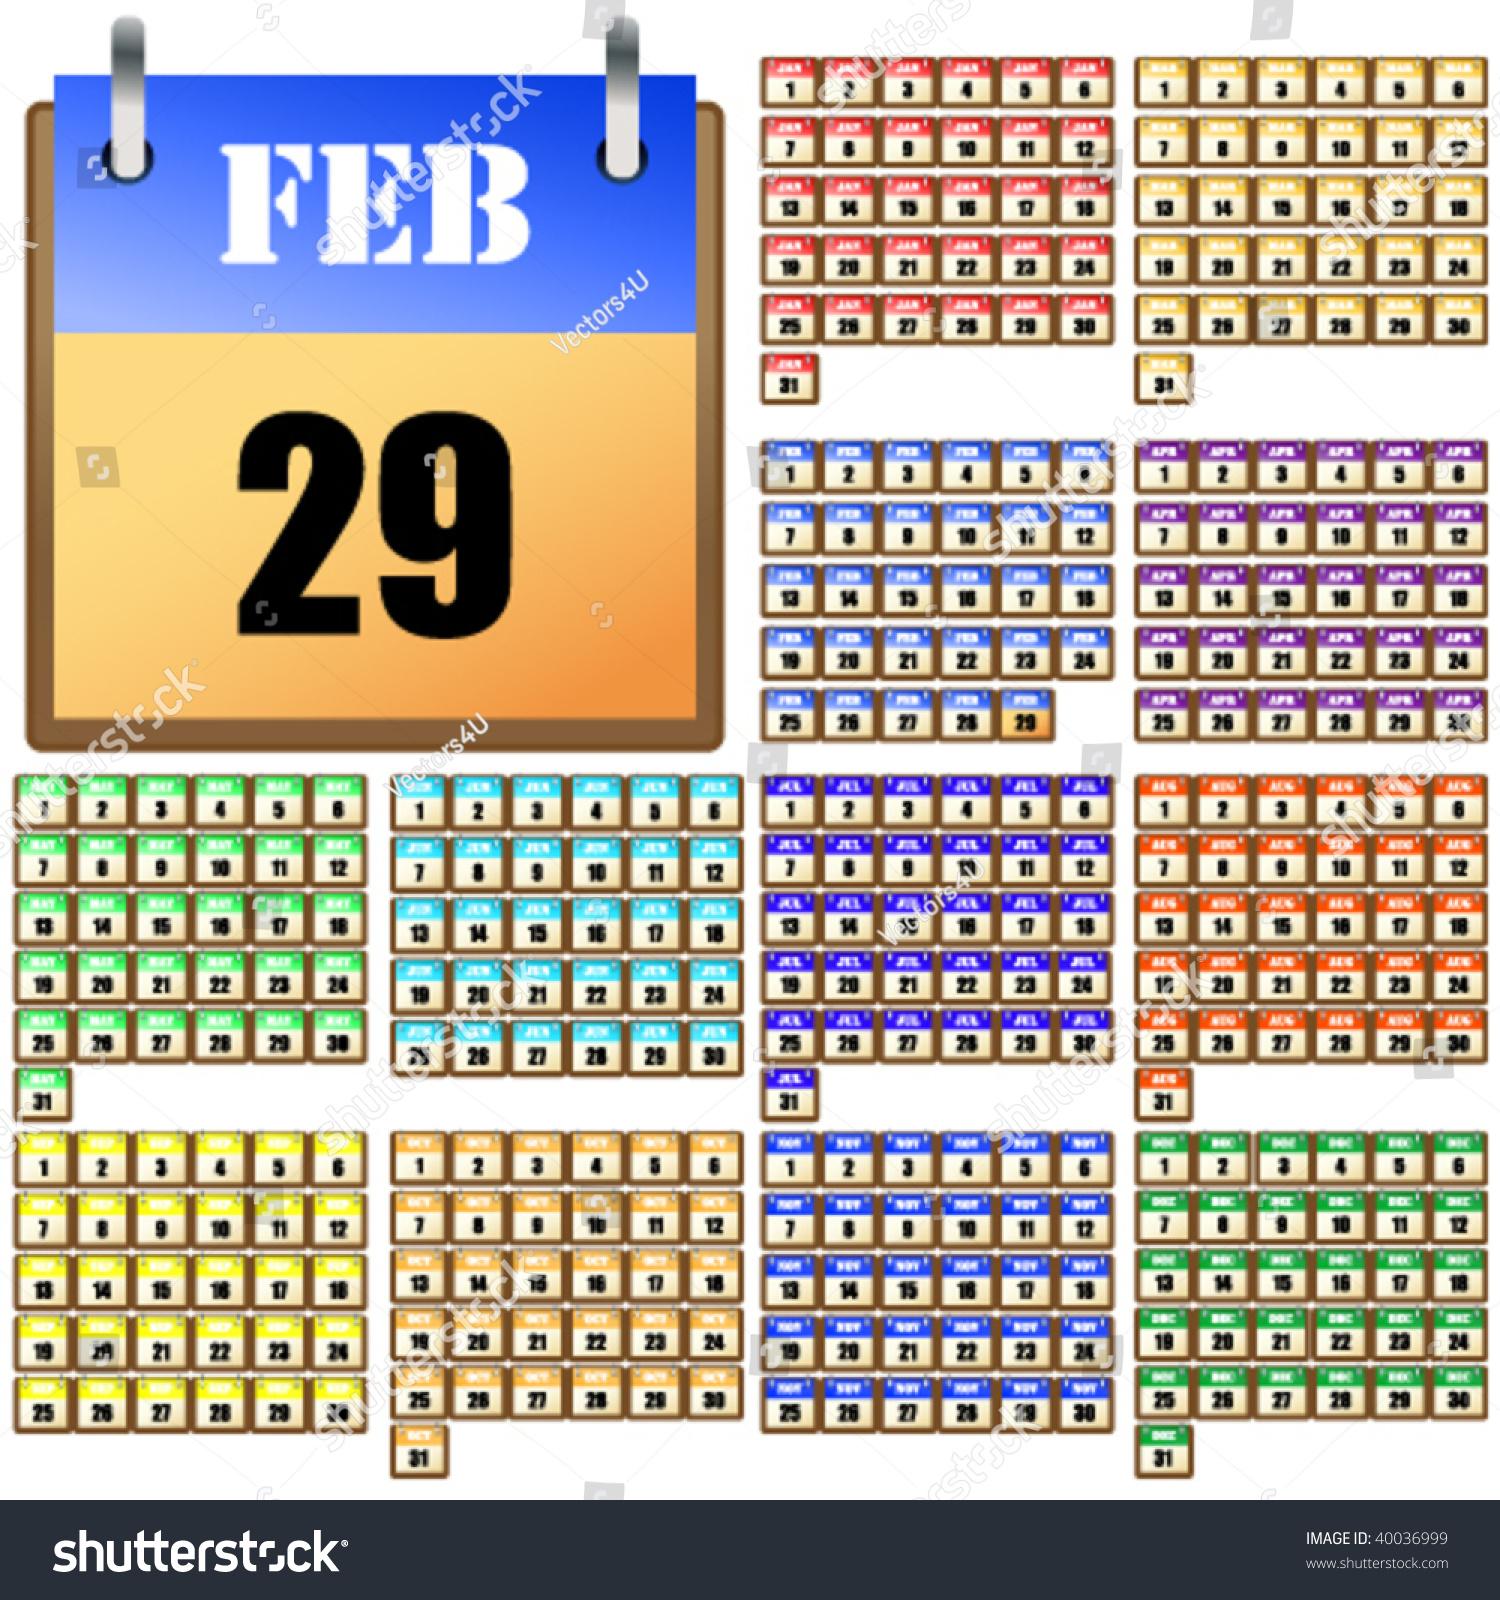 Every Year Calendar : Universal calendar for every year stock vector